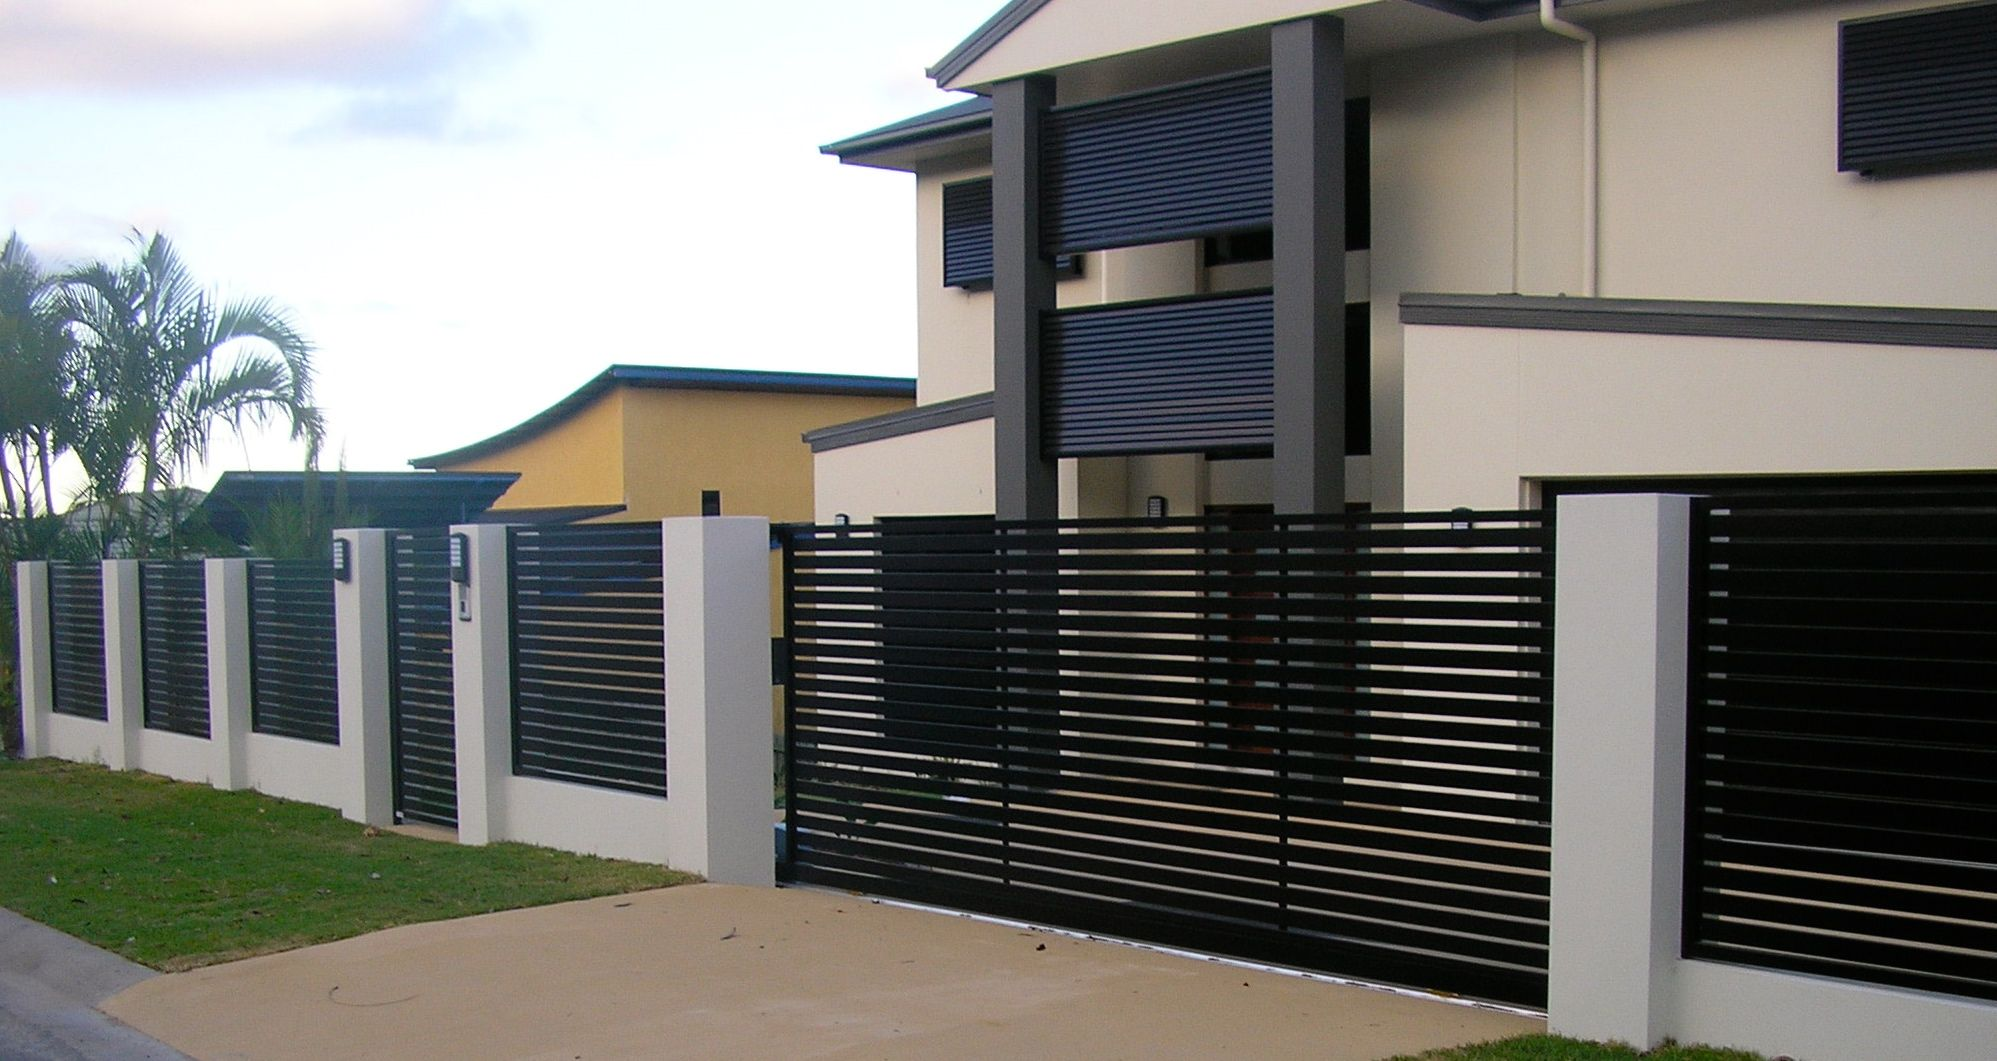 Sliding Gate Pedestrian Gate And Fence Panels Design De Cloture